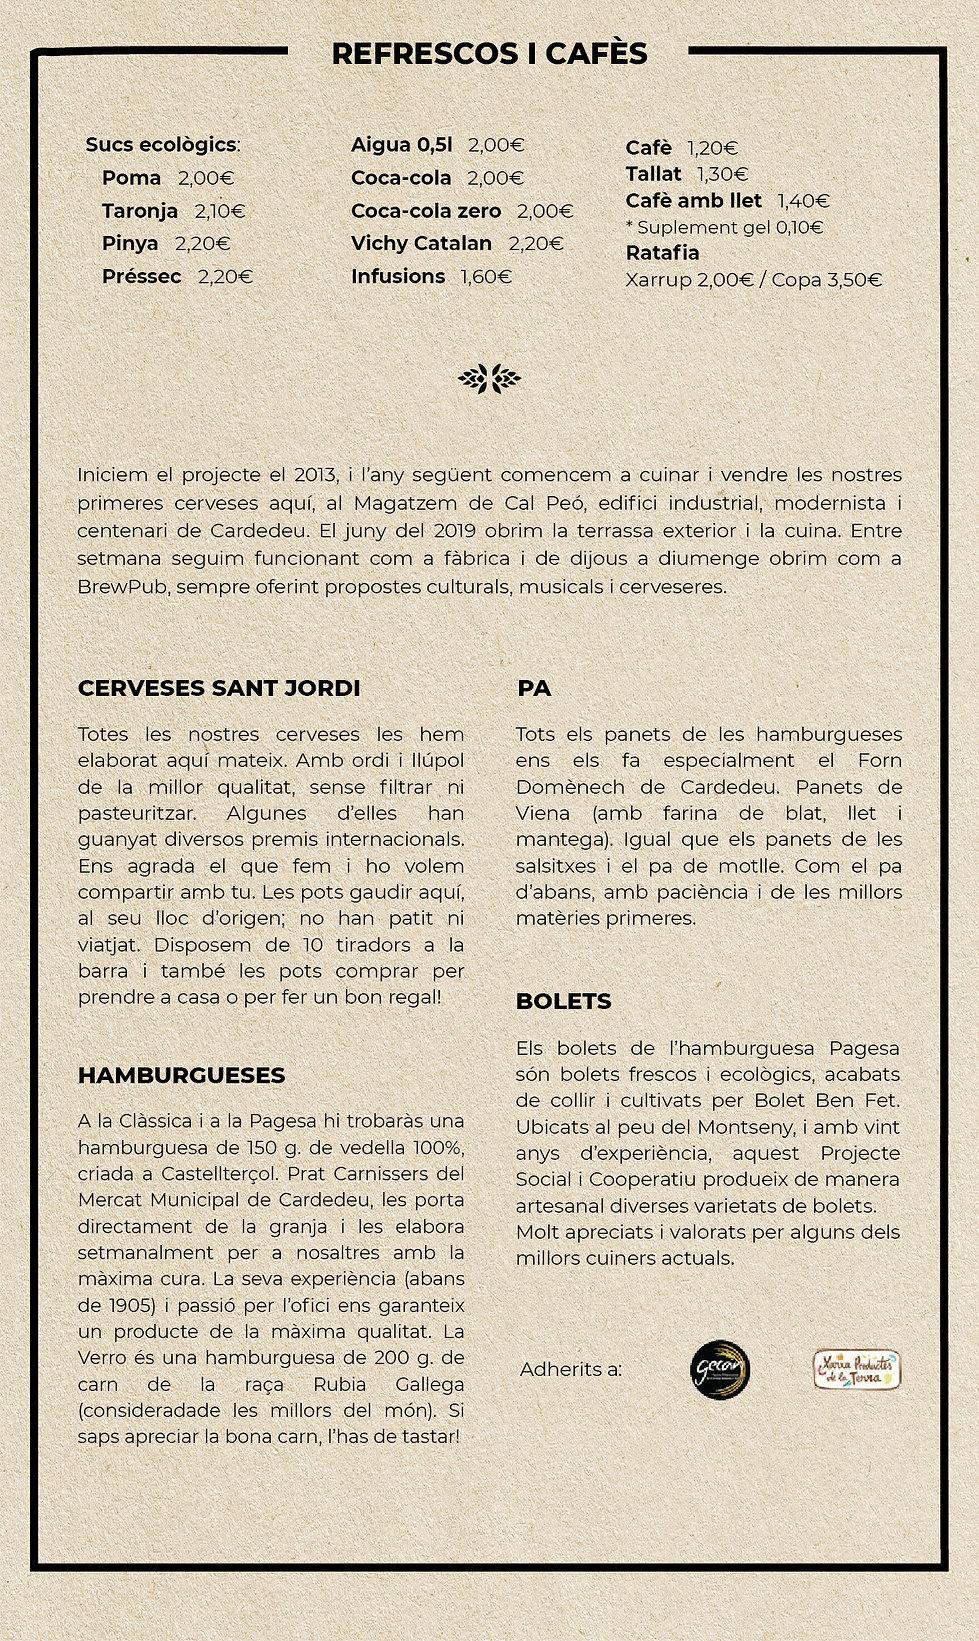 carta-refrescos_-05.jpg